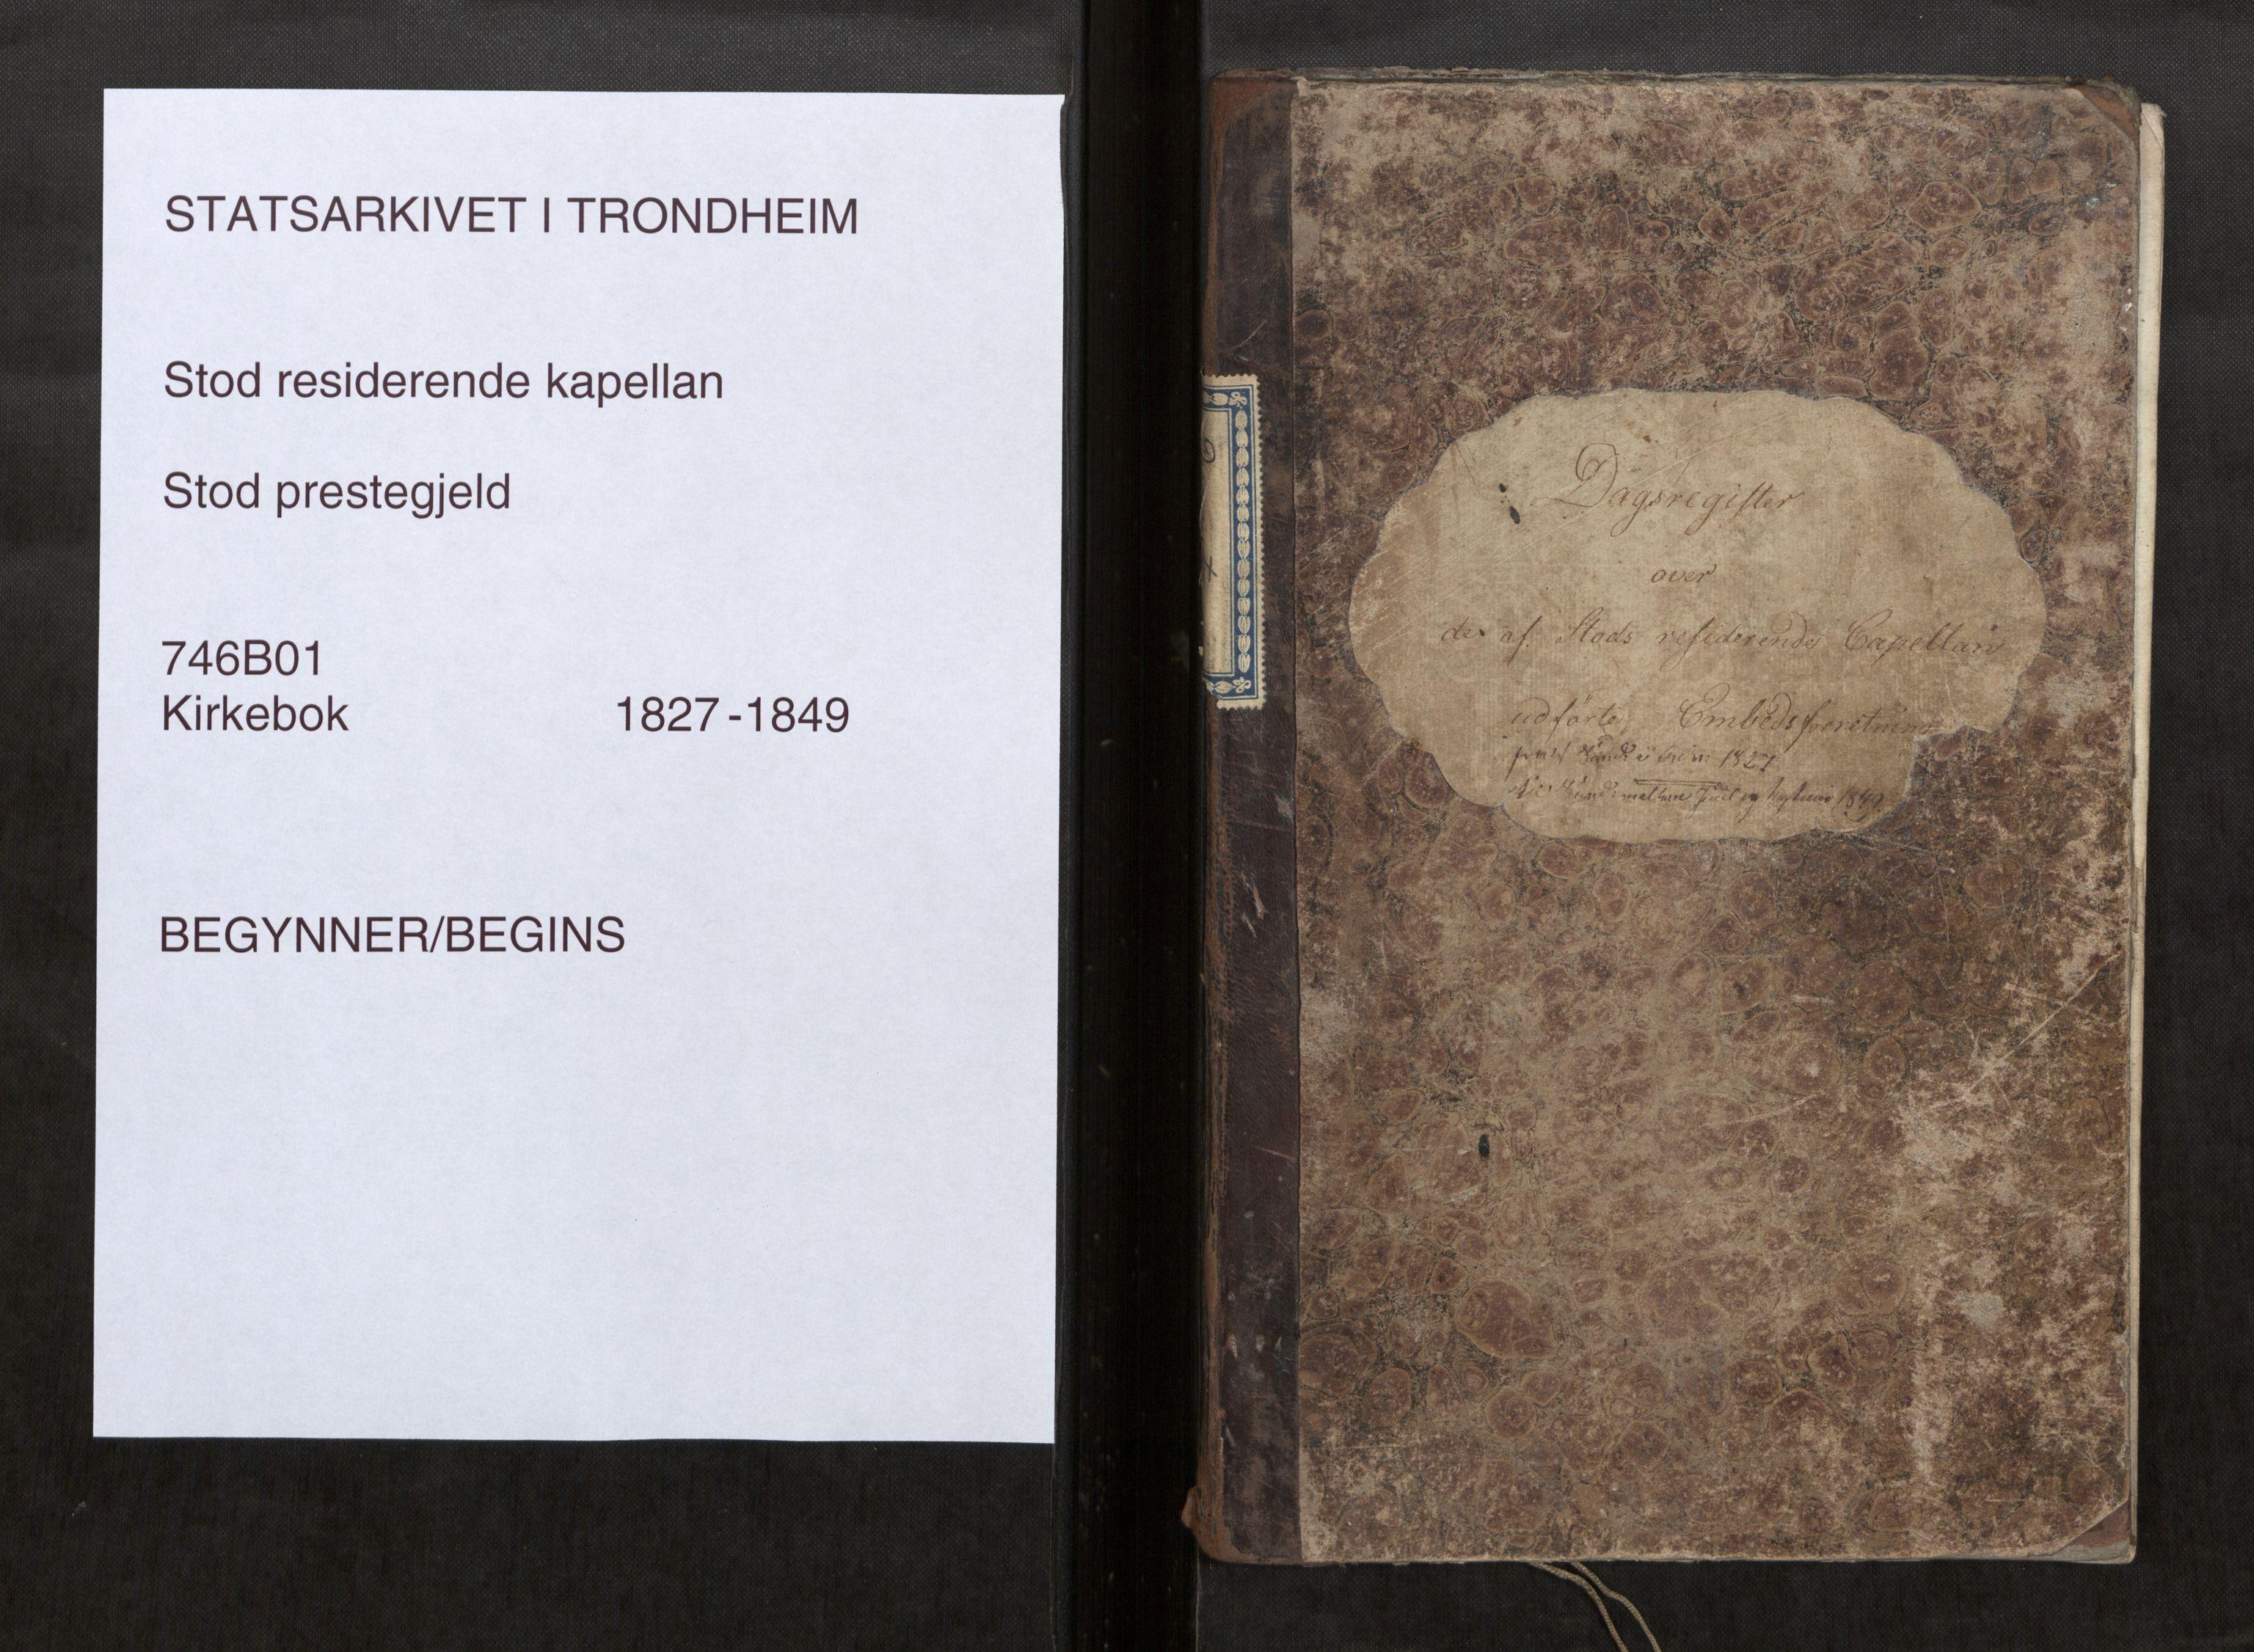 SAT, Stod sokneprestkontor, I/I1/I1d/L0001: Curate's parish register no. 1, 1827-1849